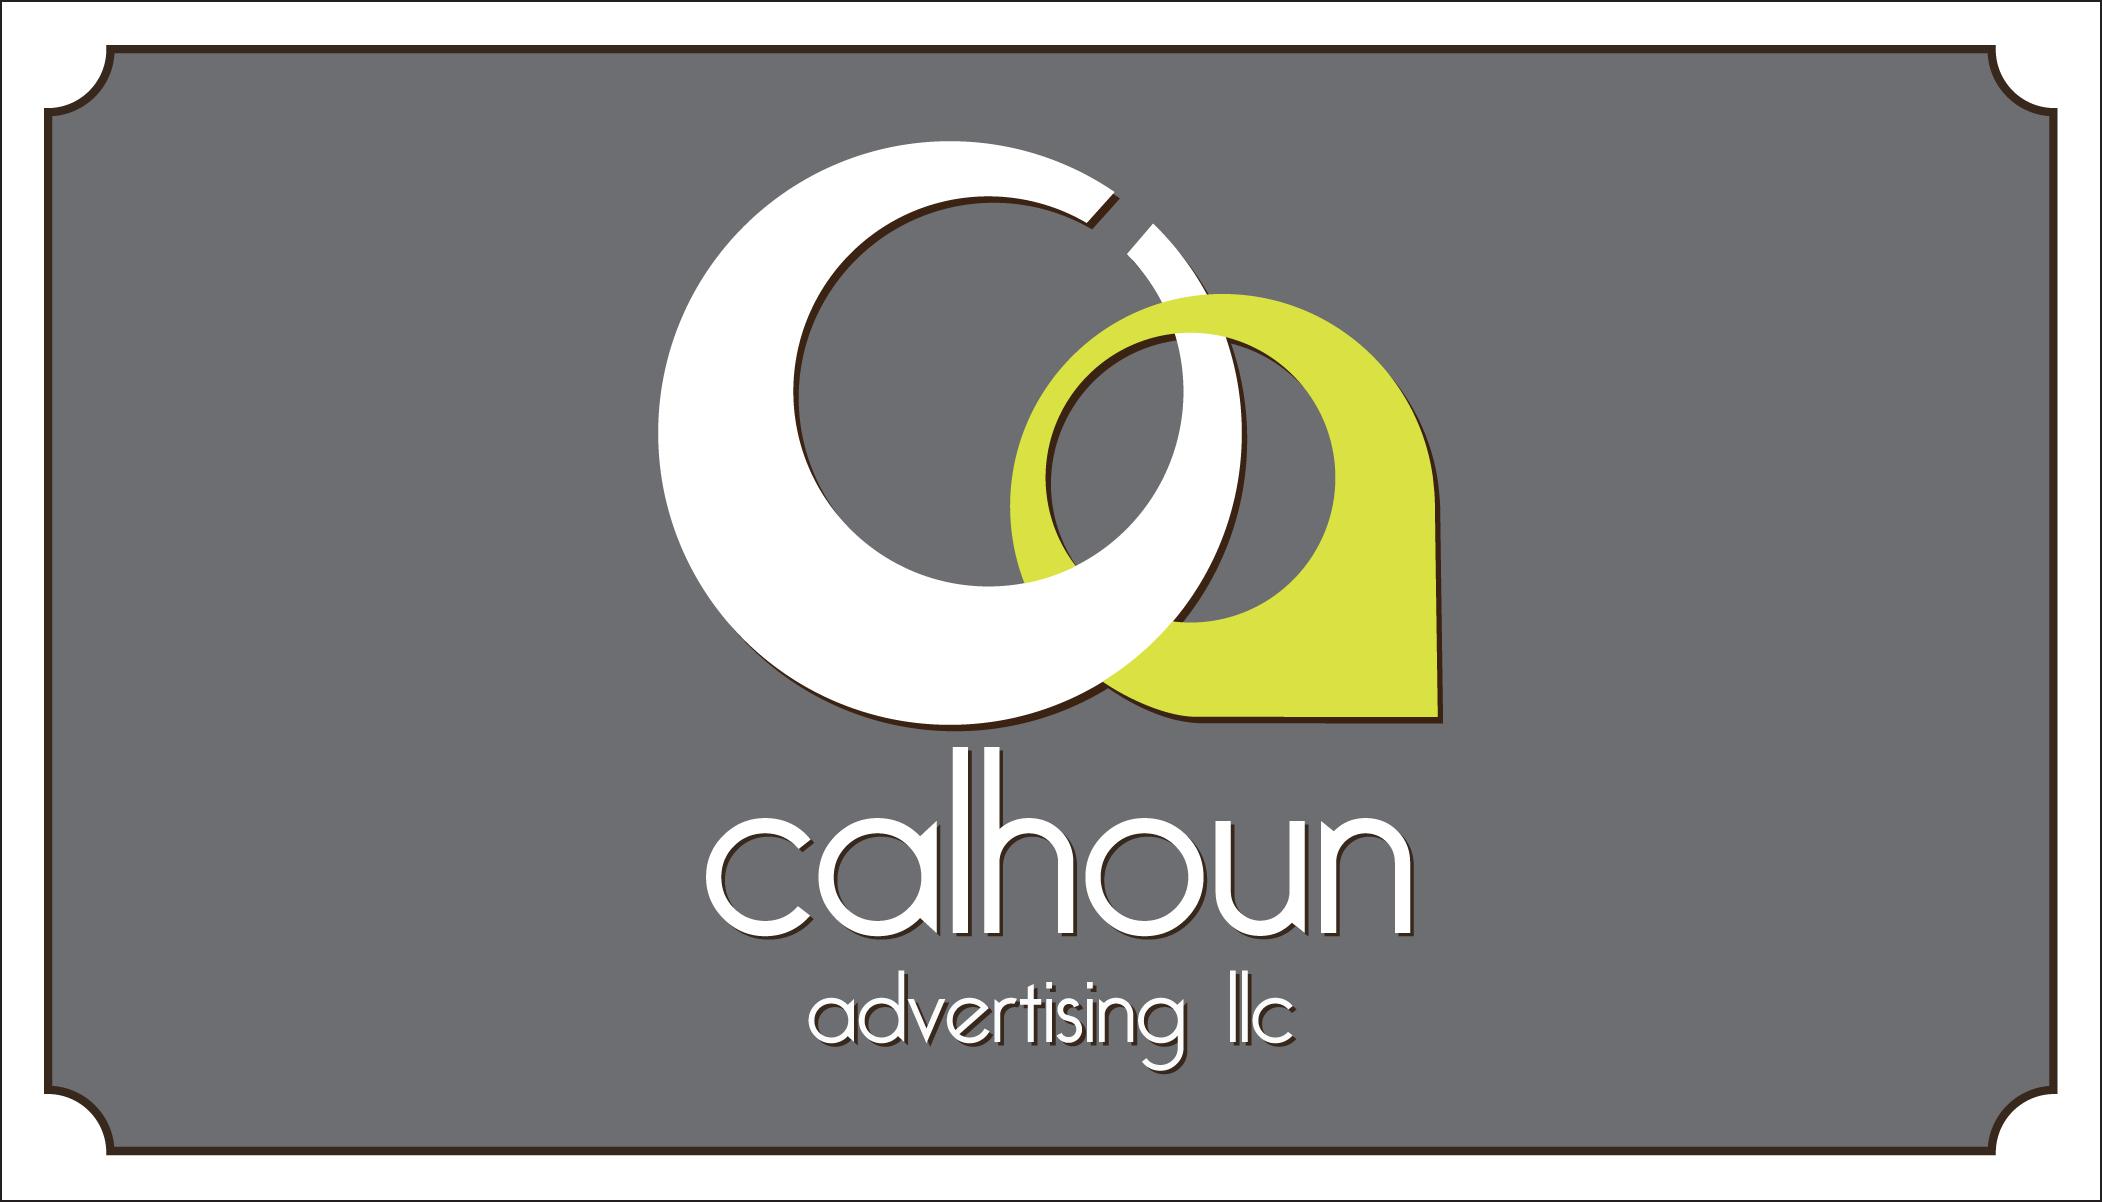 calhoun front gray.jpg